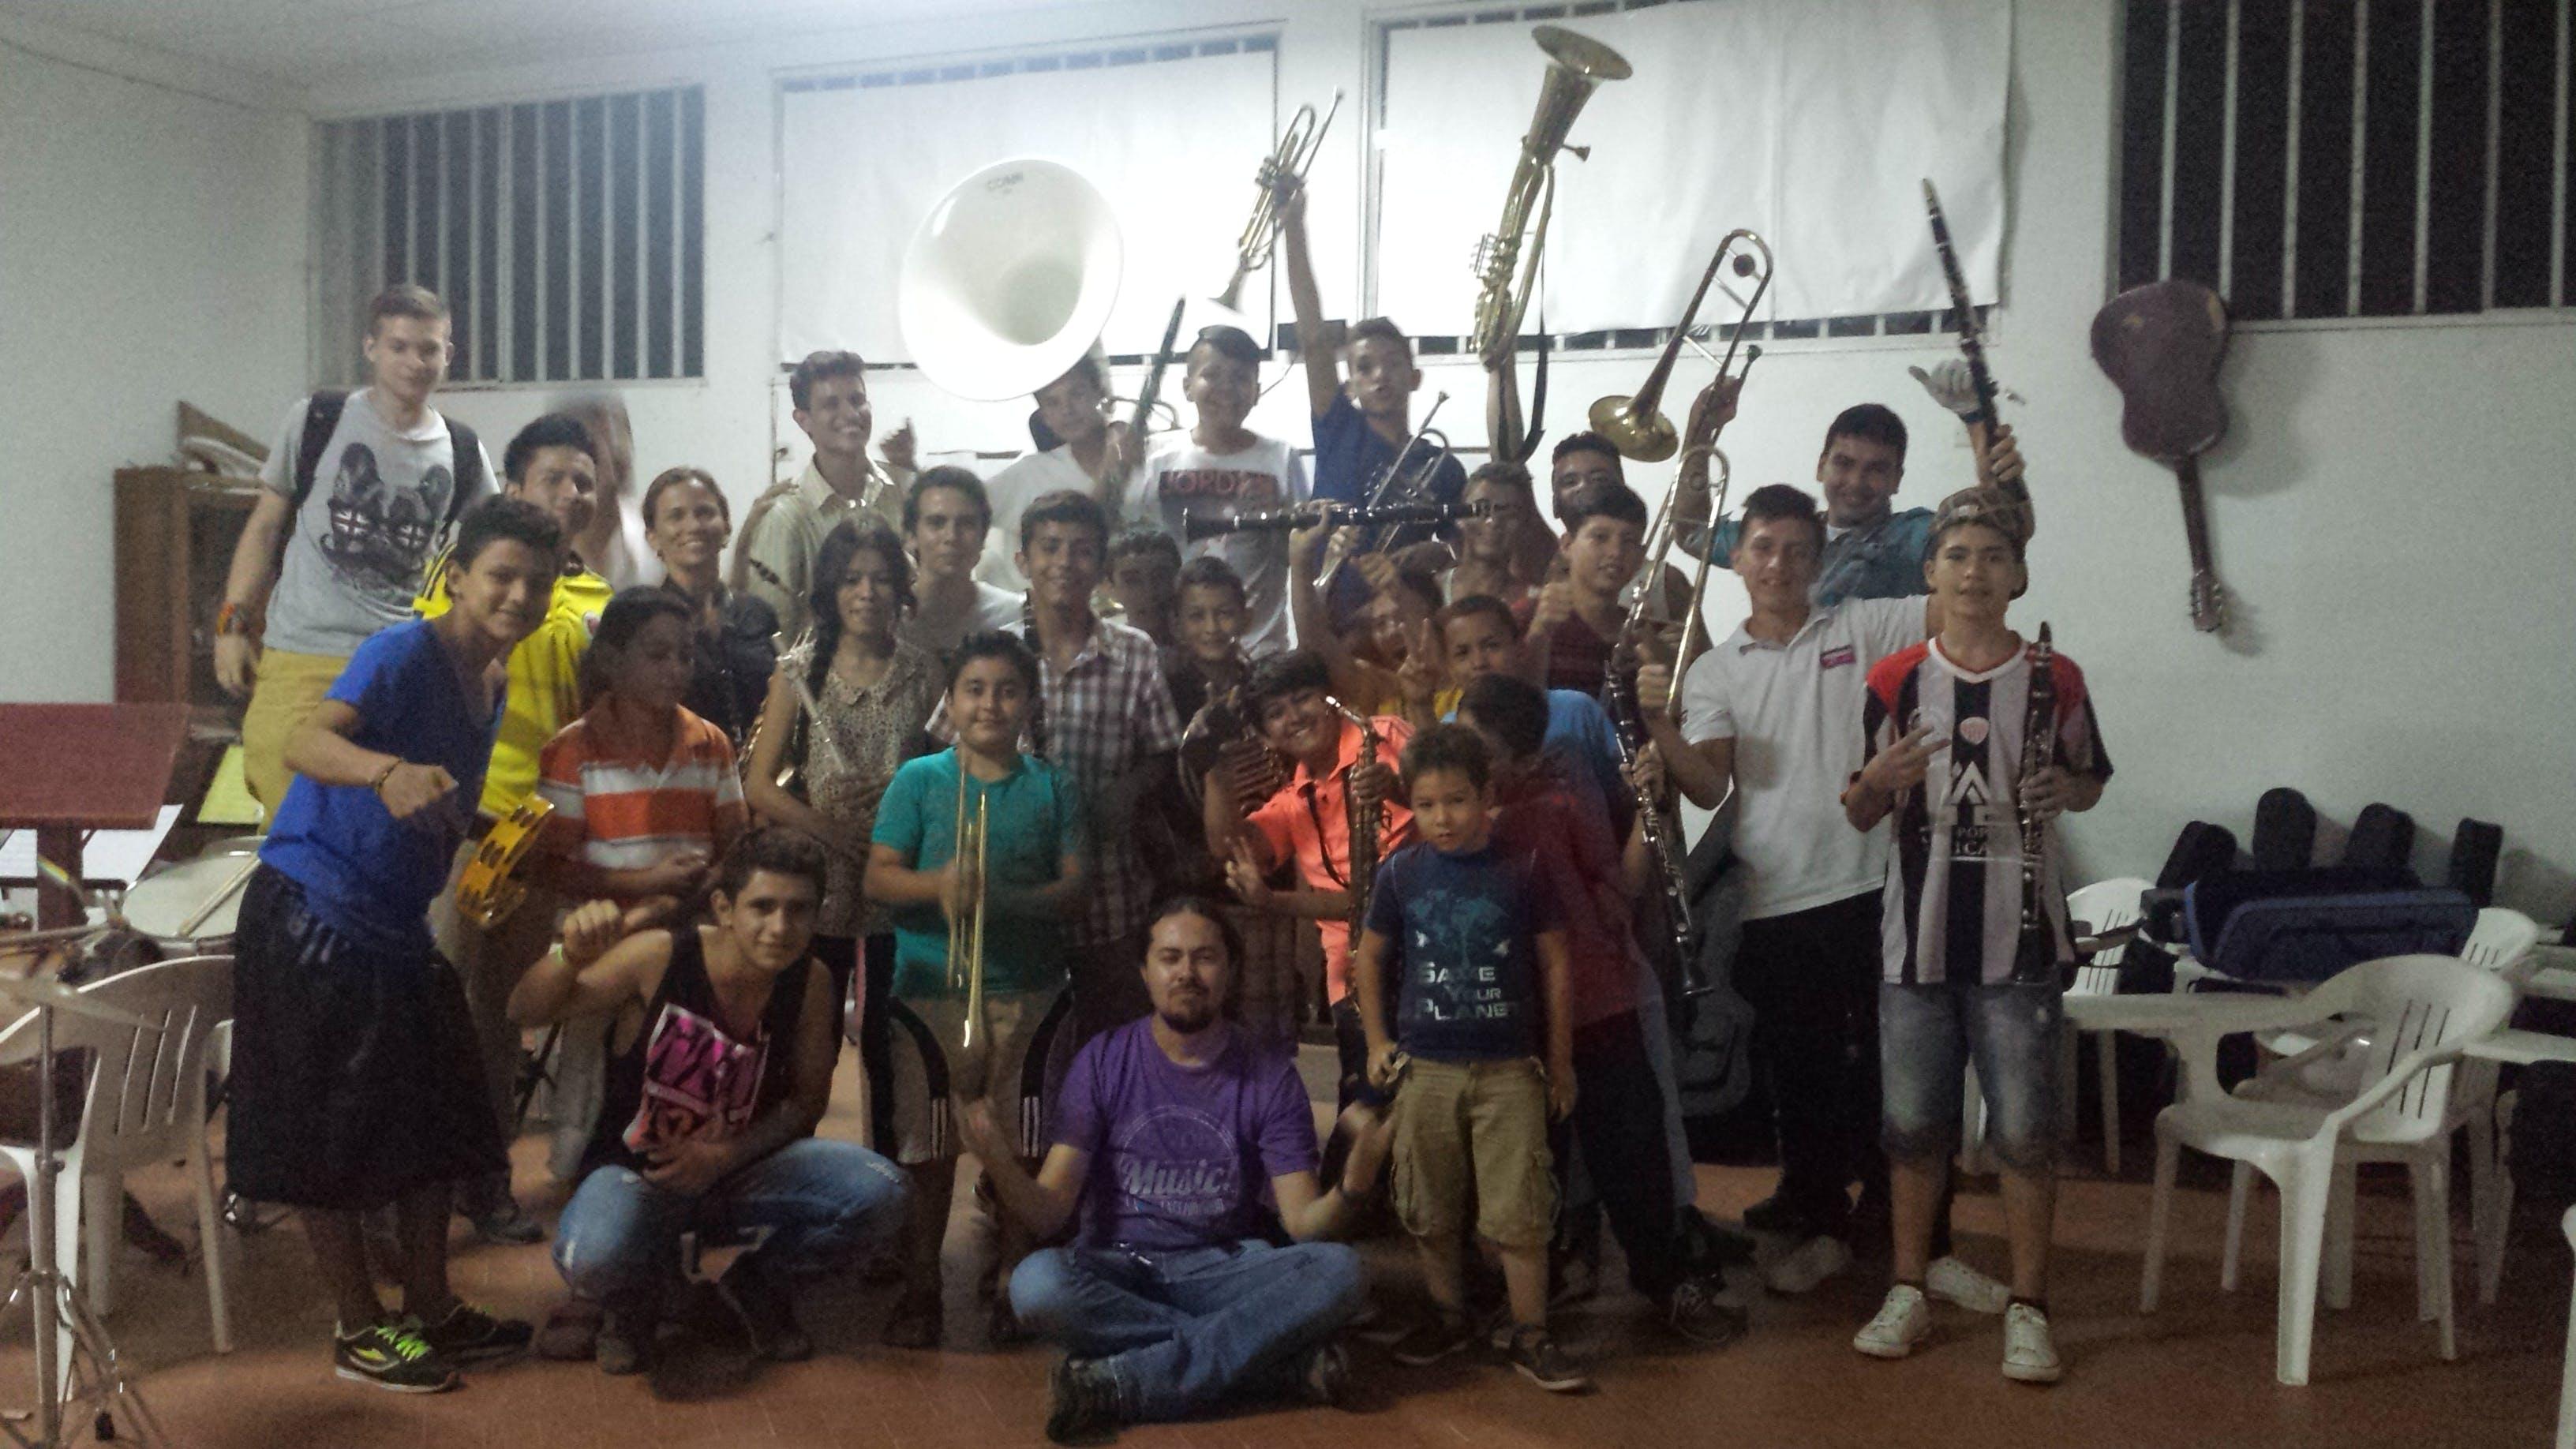 Windband ensemble